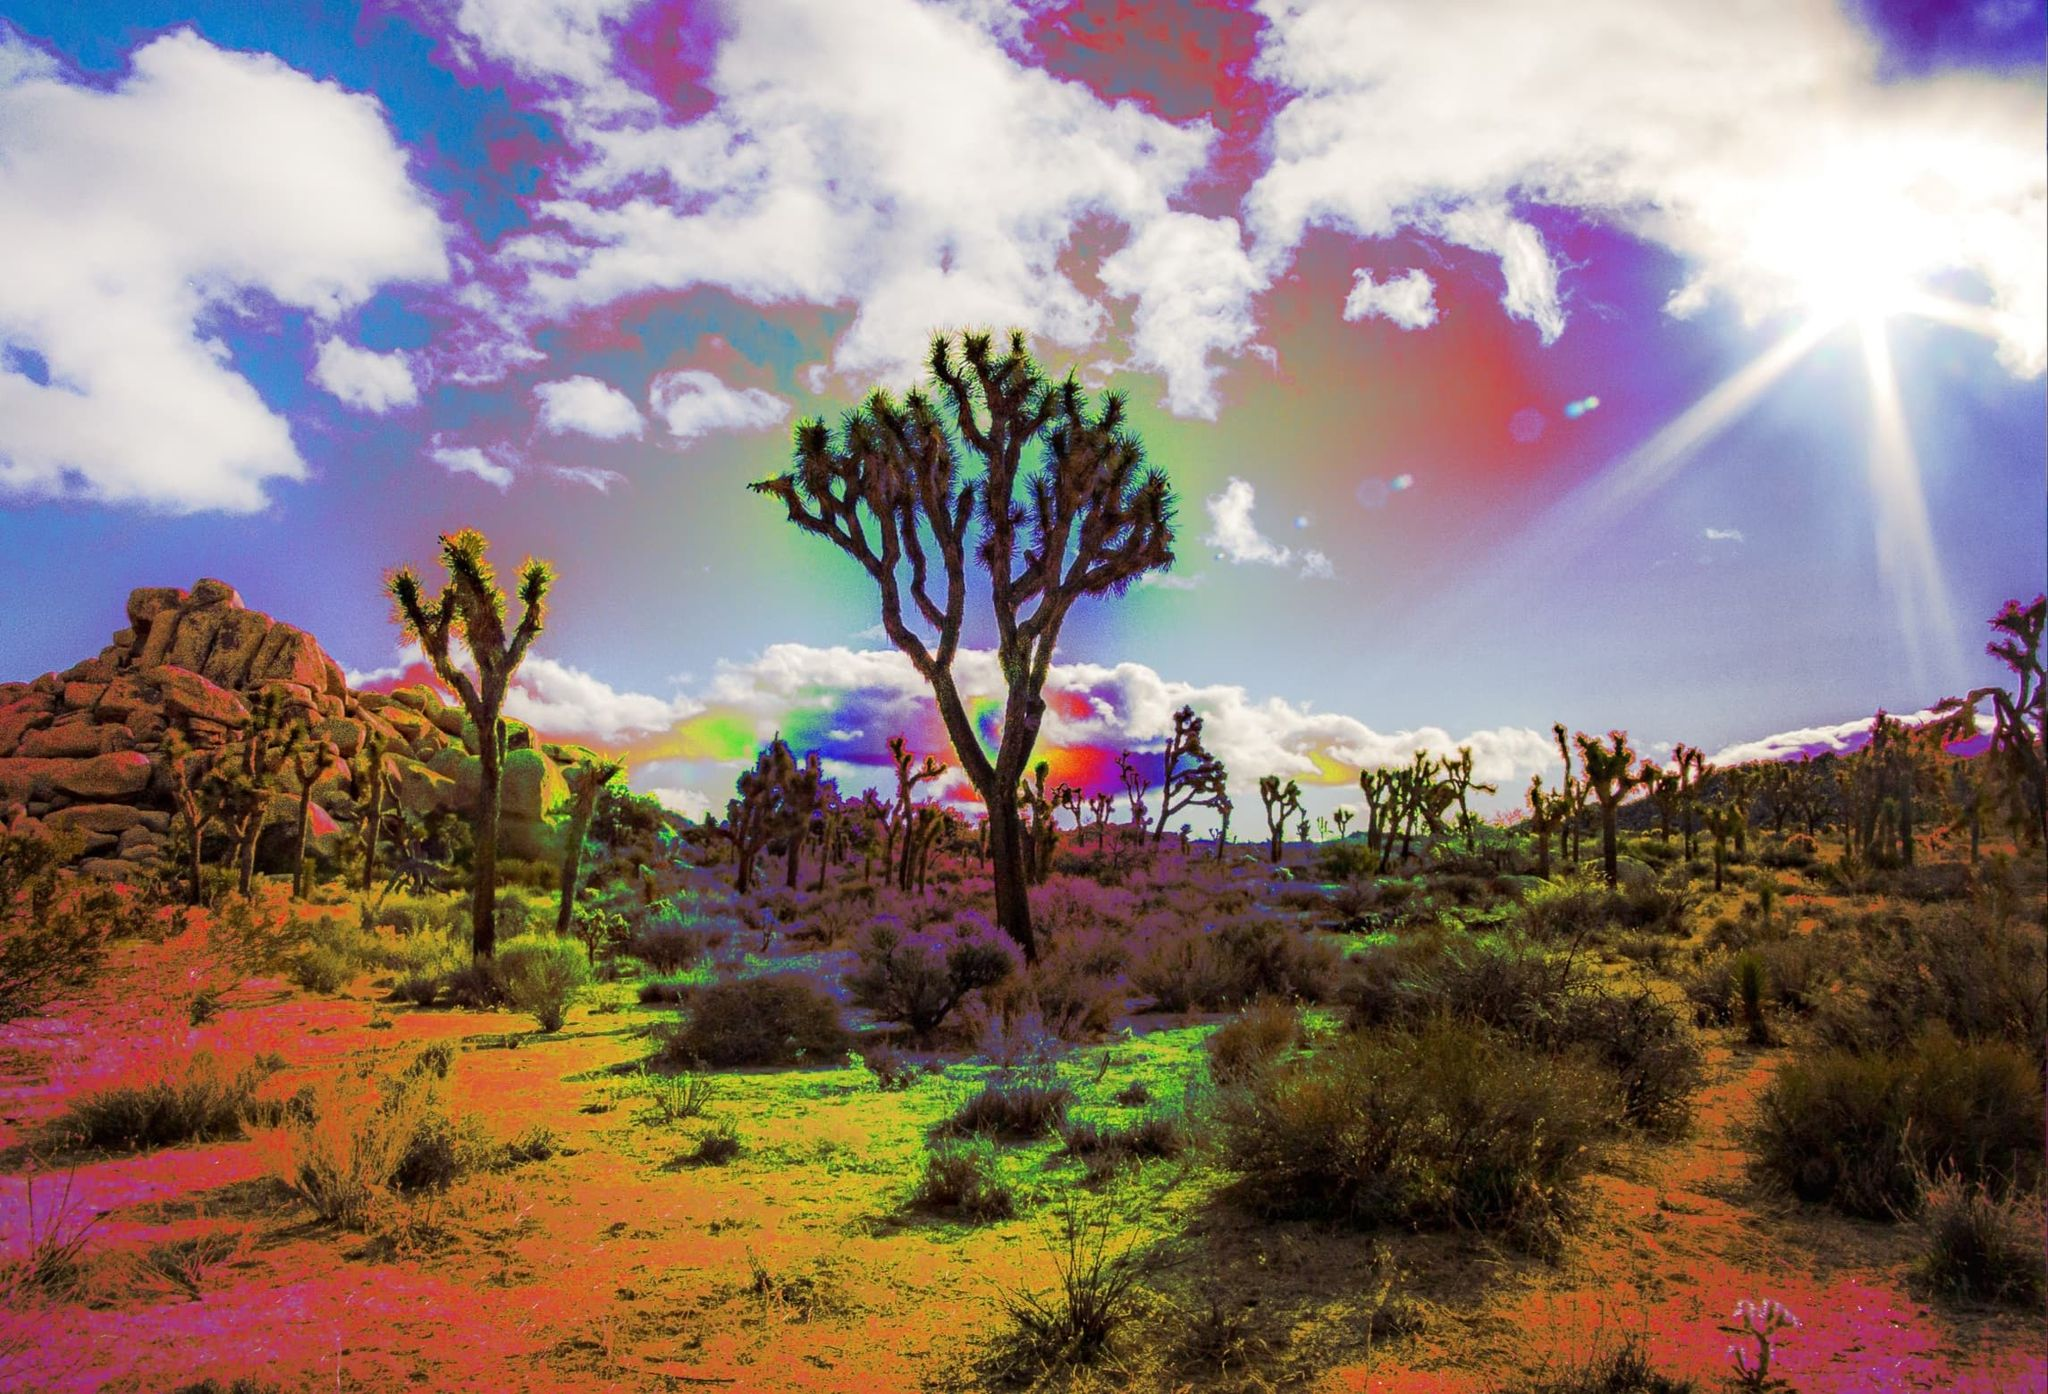 Desert Tripping-- A Closer Look at Peyote: Spiritual, Medicinal, & Controversial 3